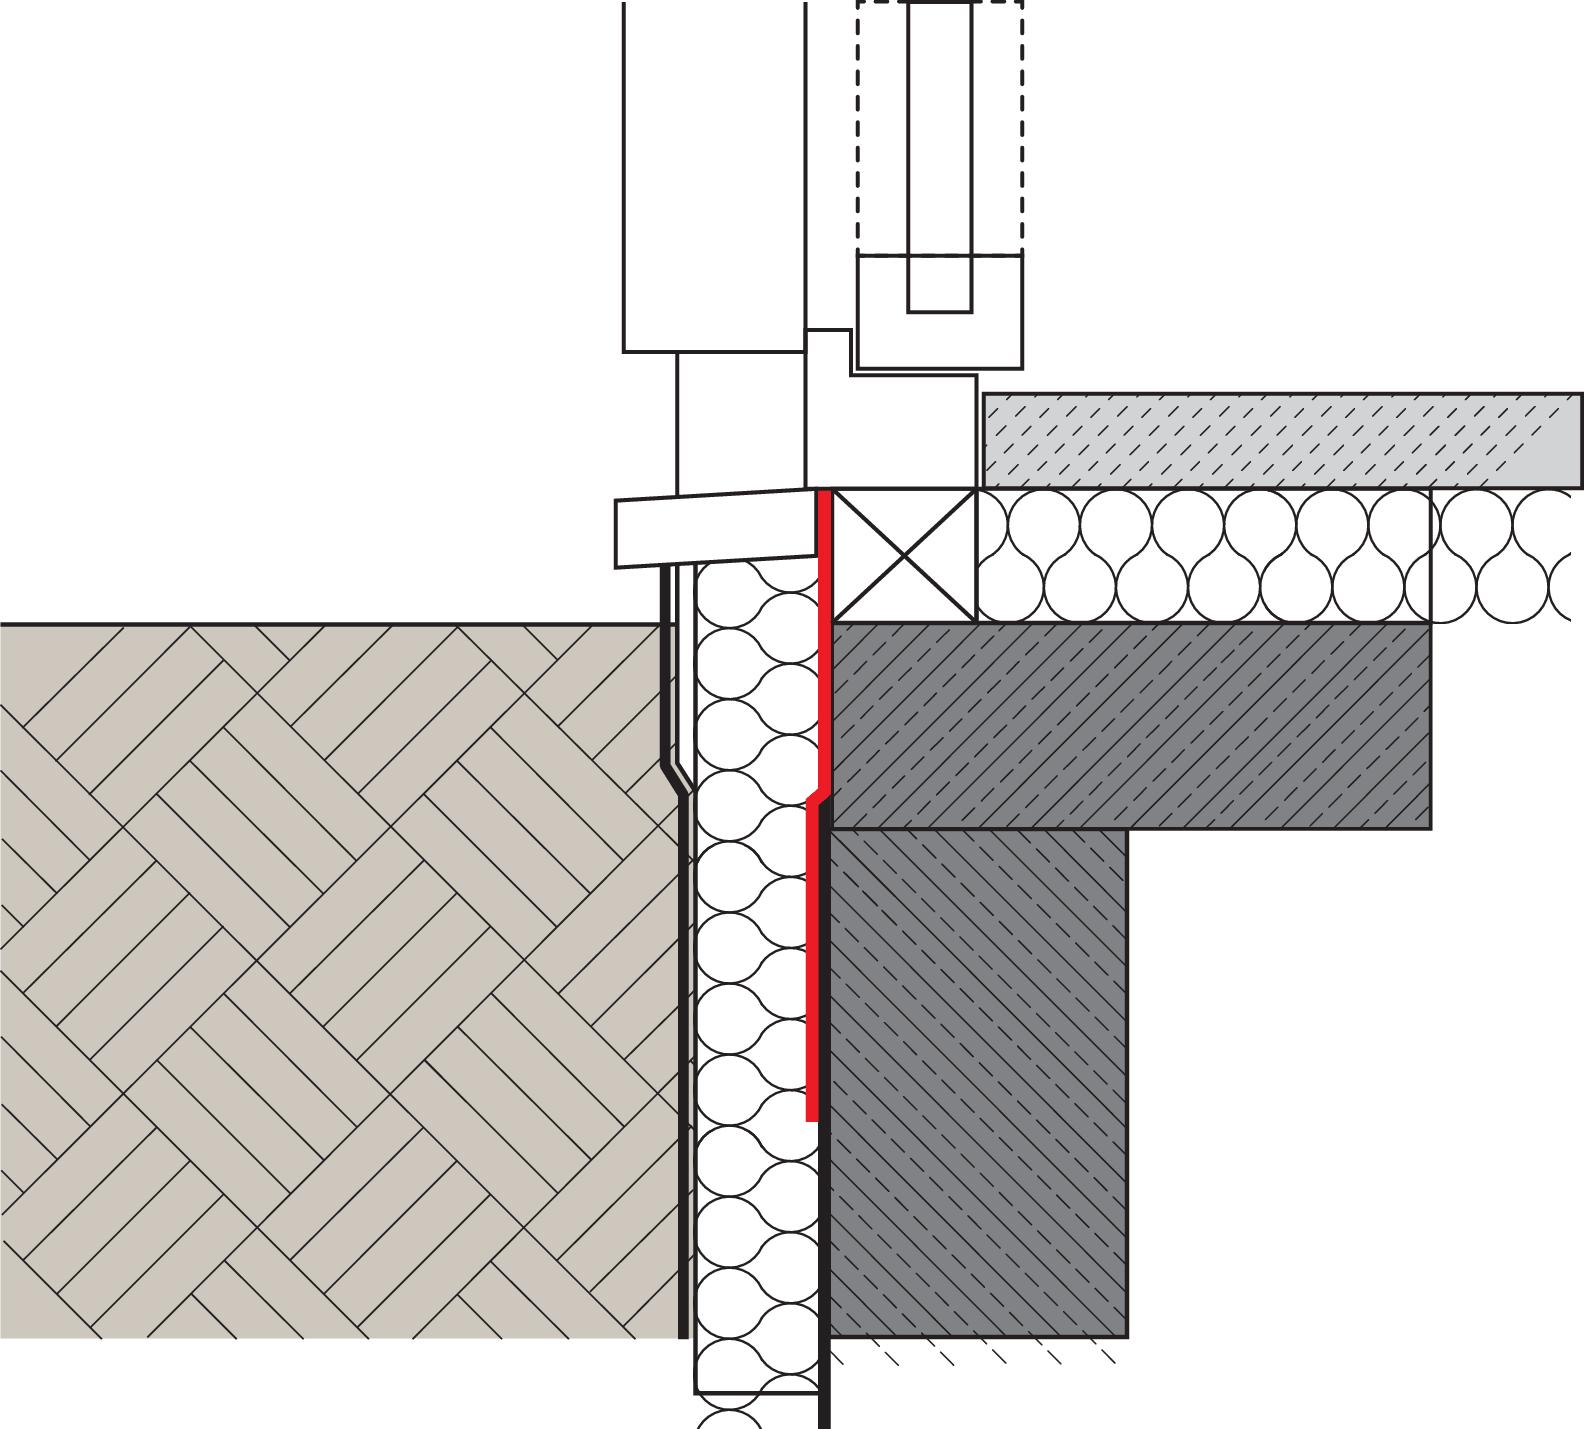 Relativ MB 2K zur Abdichtung bodentiefer Fenster à la Remmers GV81